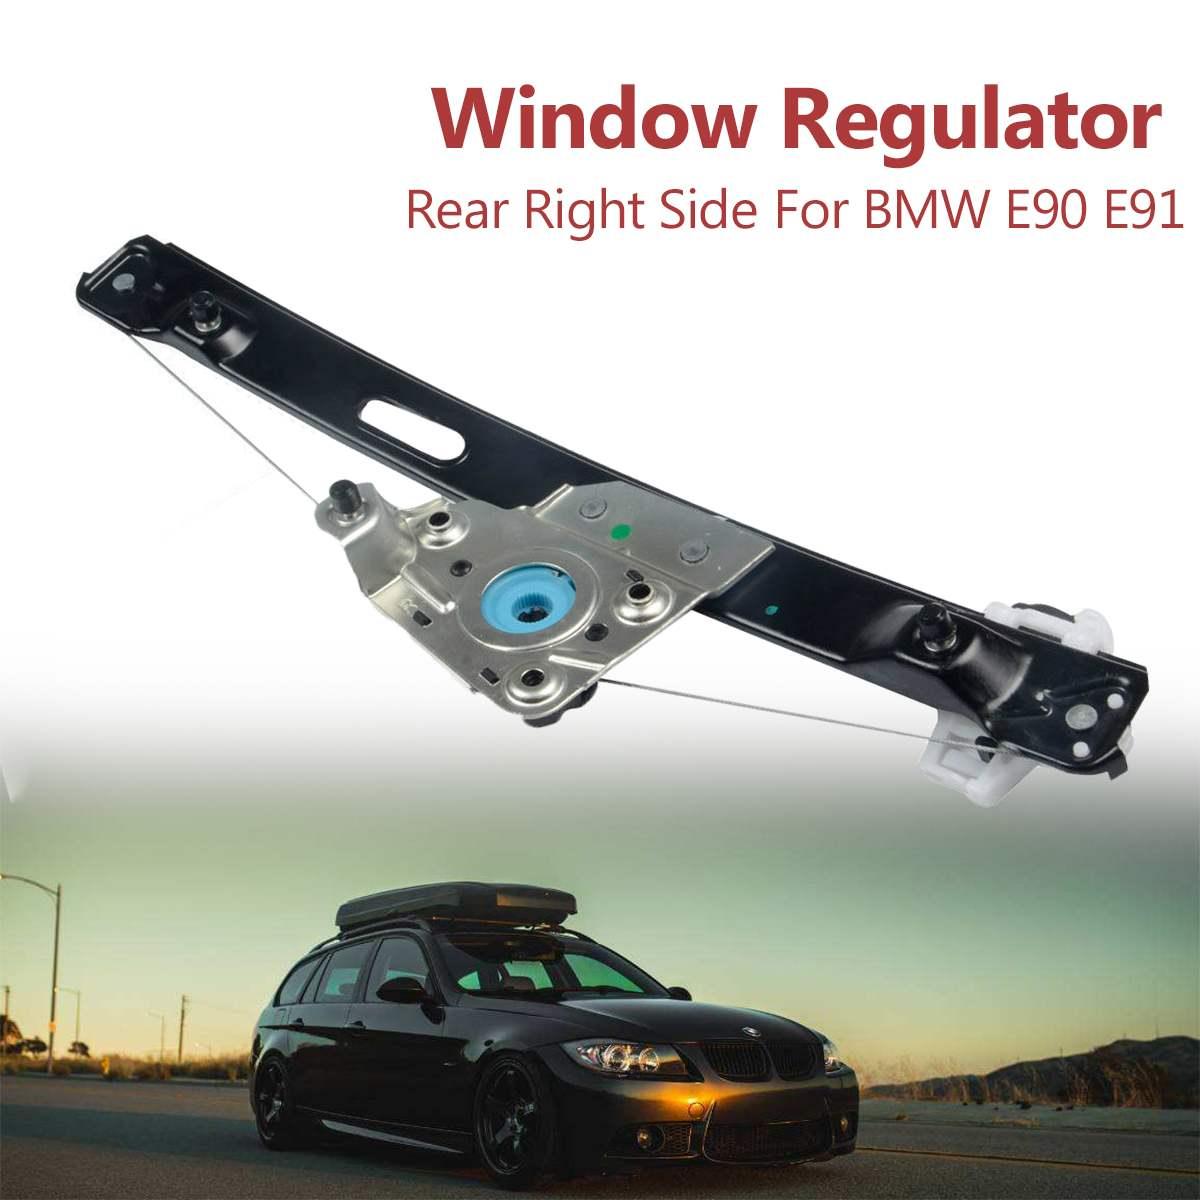 Car Rear Right Power Window Regulator Passenger Side For BMW E90 E91 316 318i 320i 323i 325i 328i 330i M3 51337140590